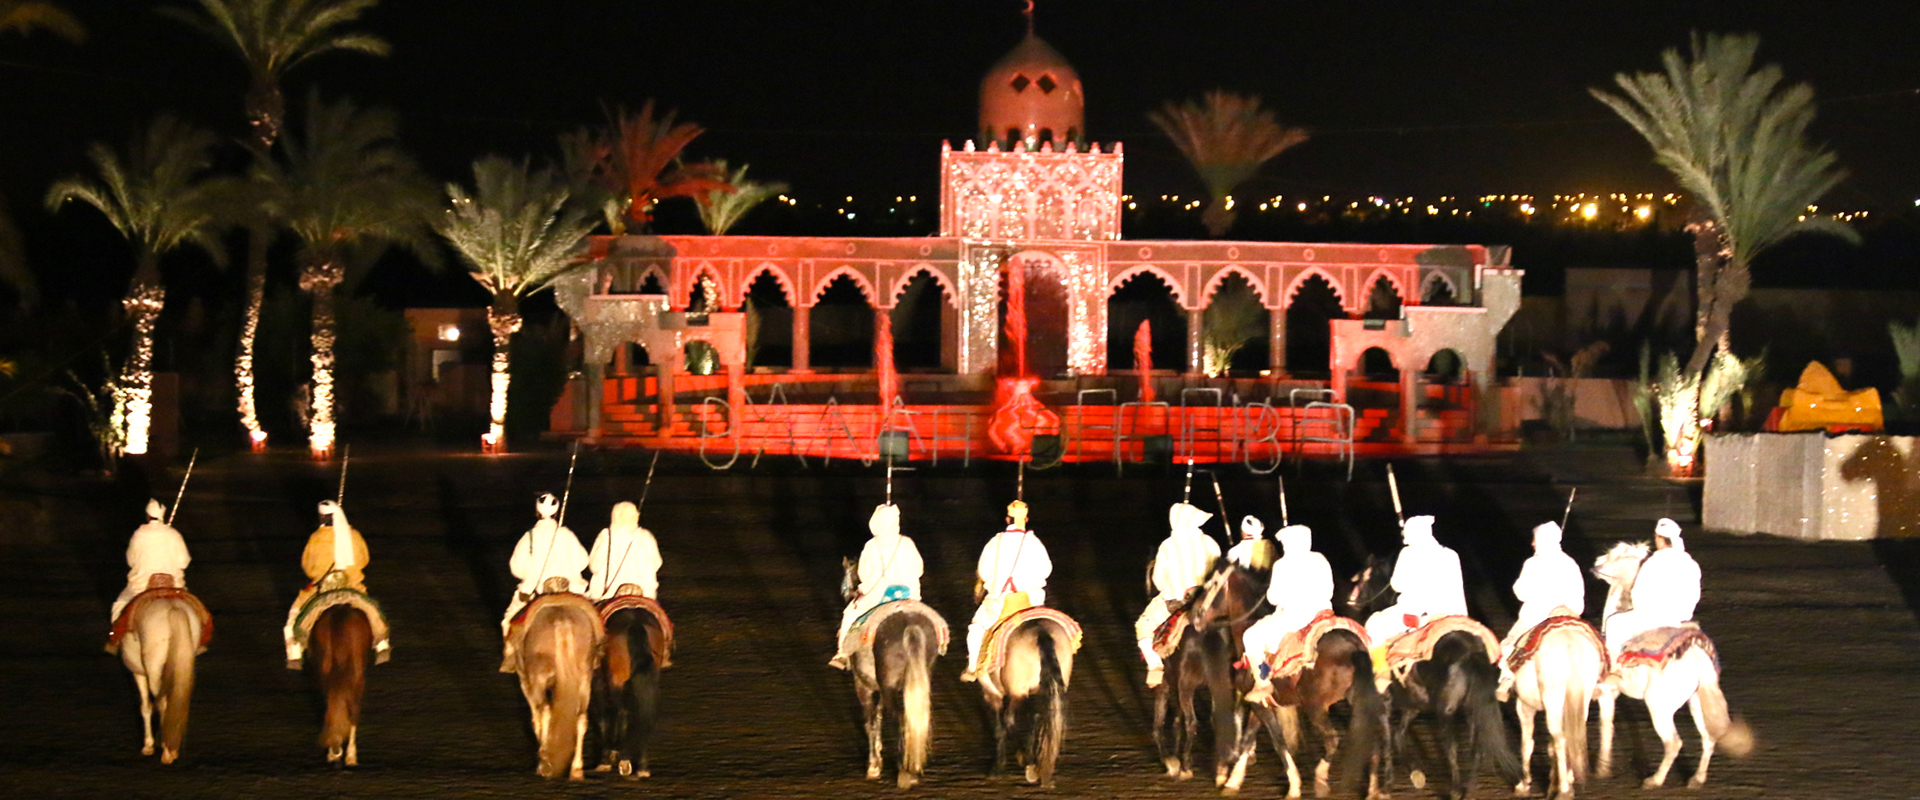 morocco-fantasia-tborida1532121836